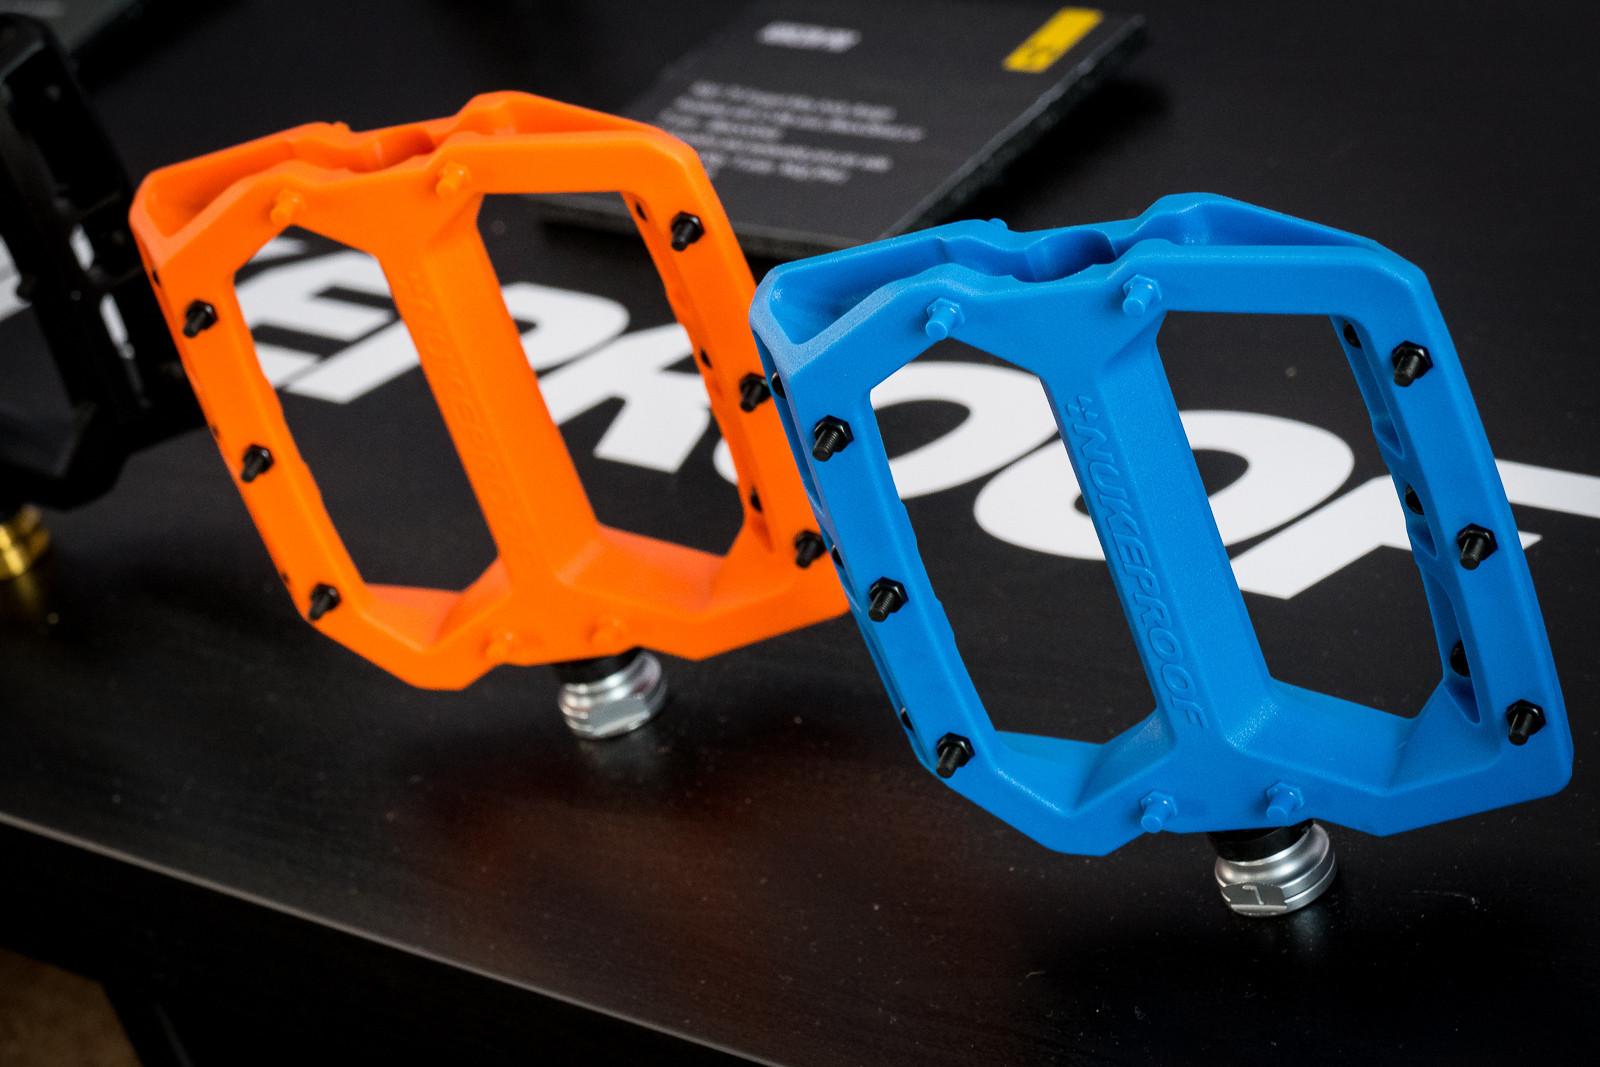 Nukeproof Horizon Comp Pedals - 2016 Mountain Bike Components at Eurobike - Mountain Biking Pictures - Vital MTB